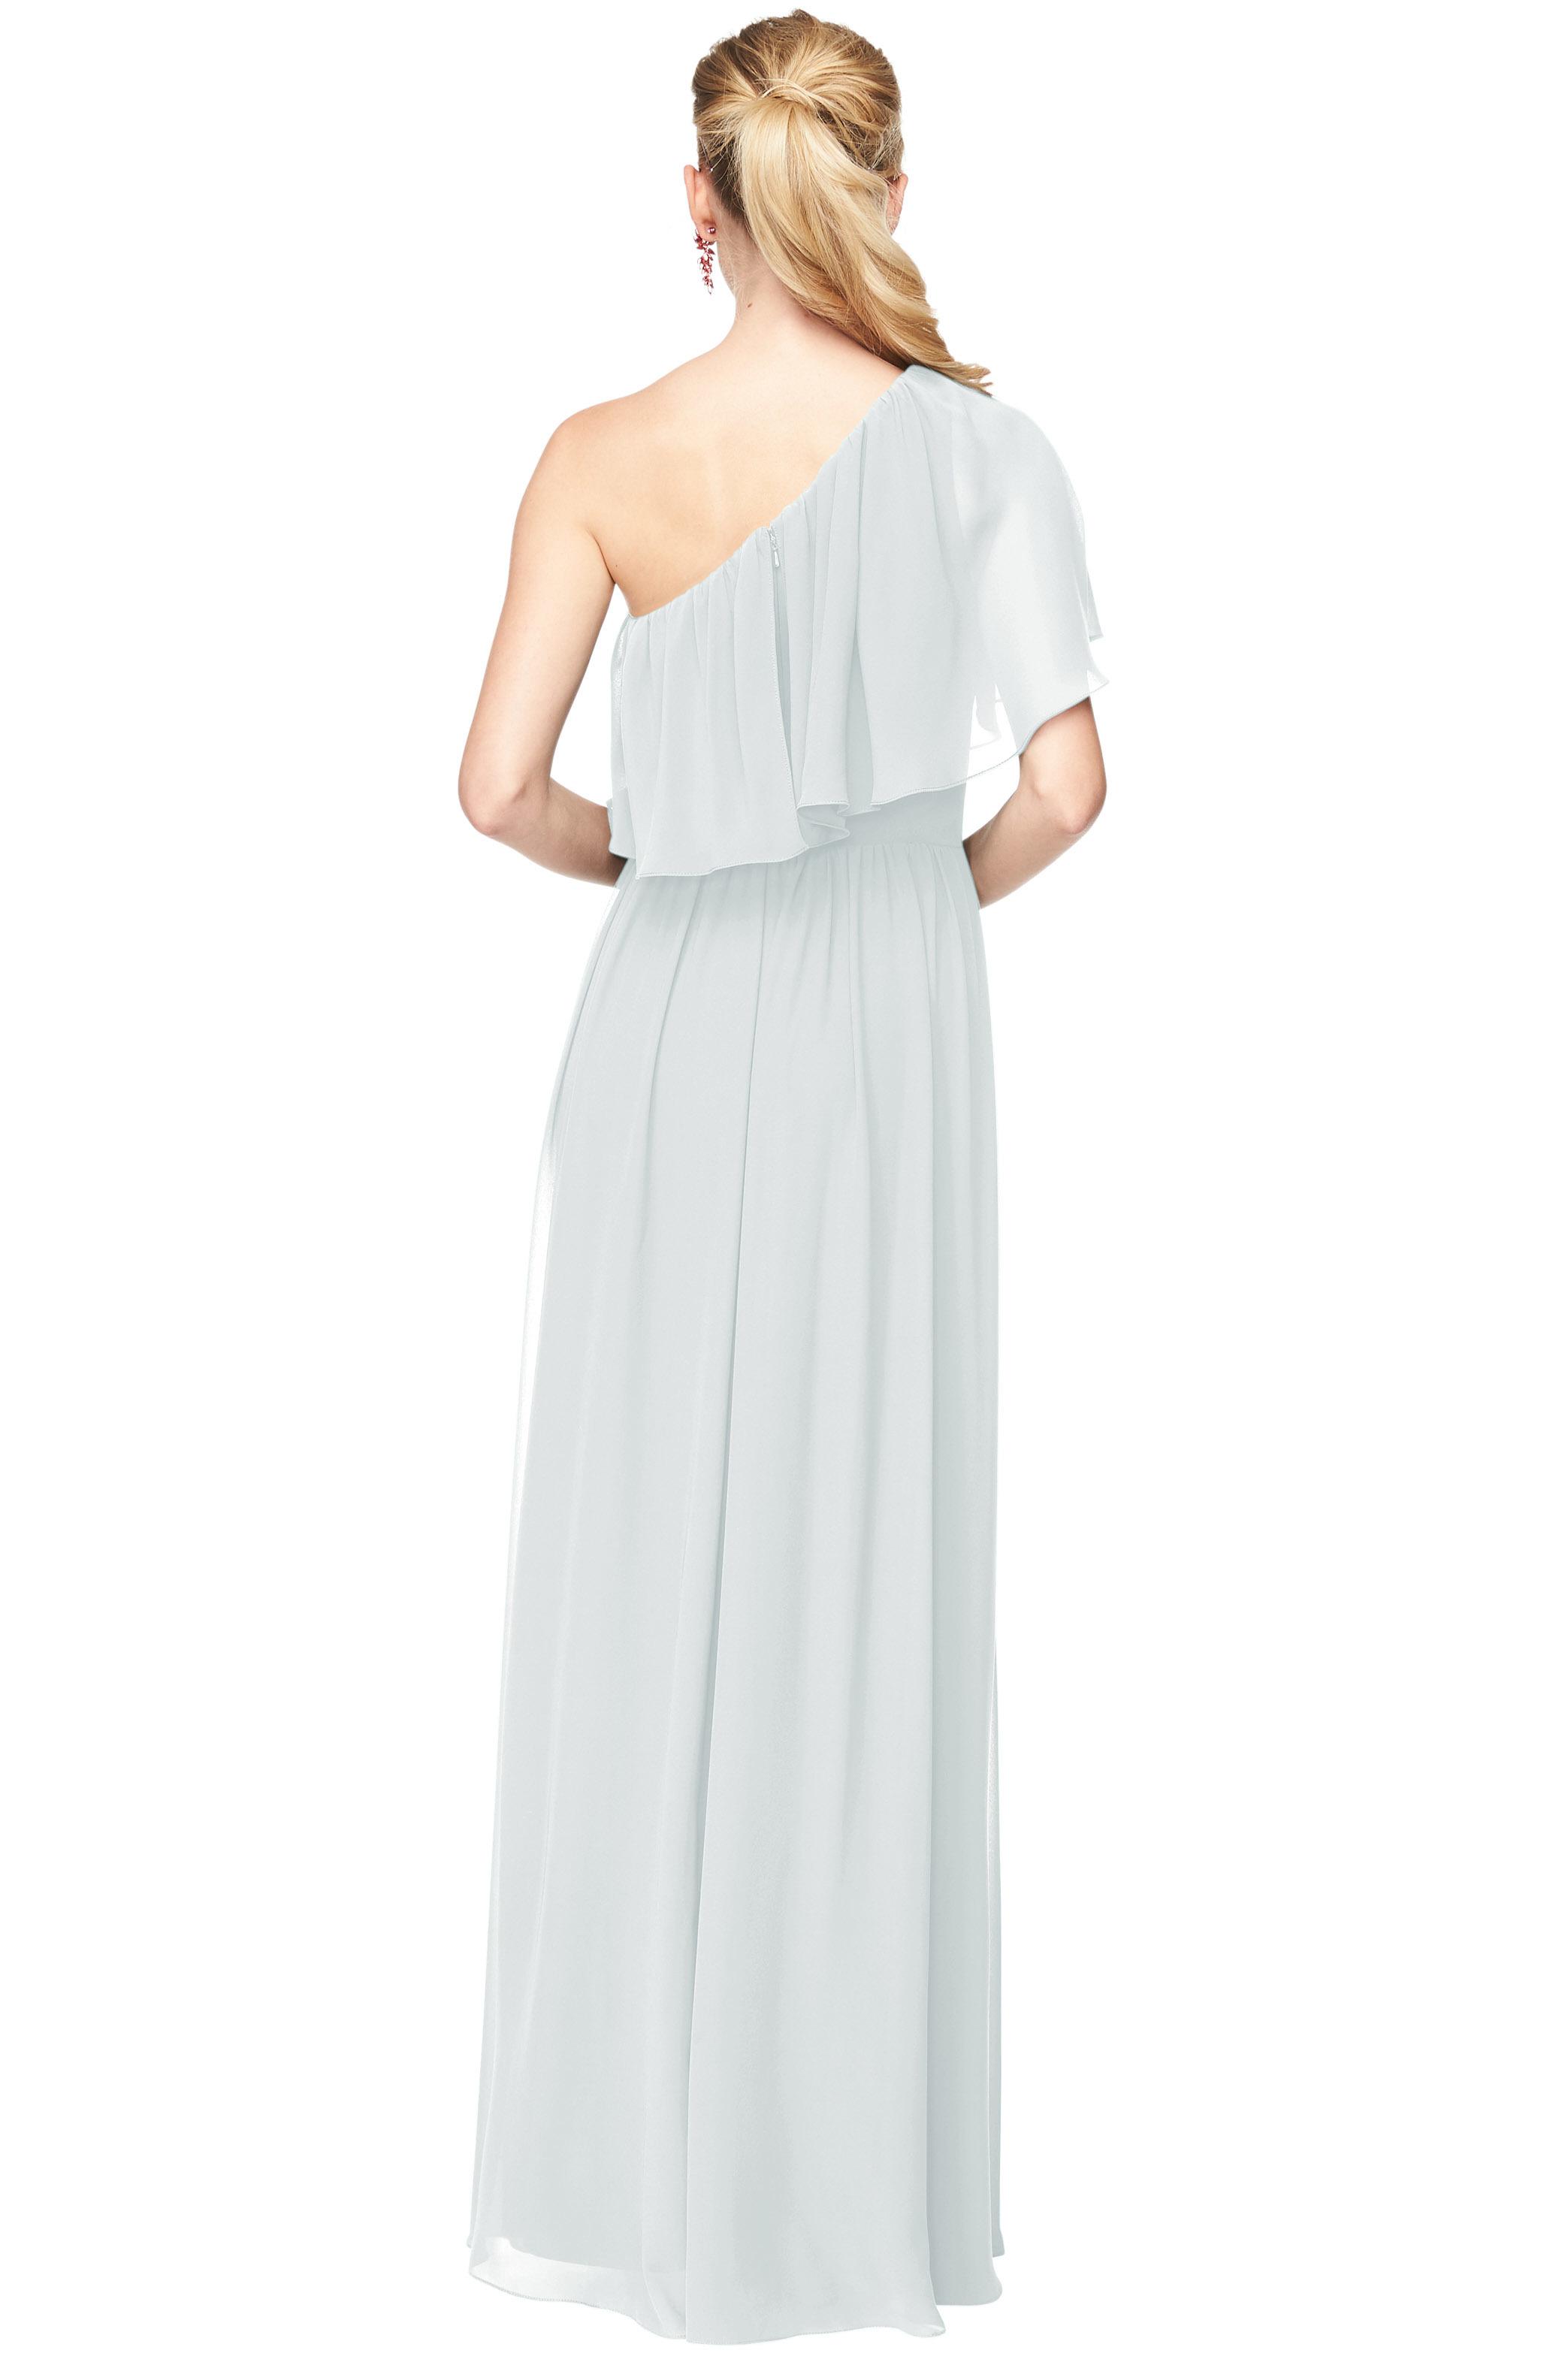 Bill Levkoff MIST Chiffon One-Shoulder A-Line gown, $156.40 Back